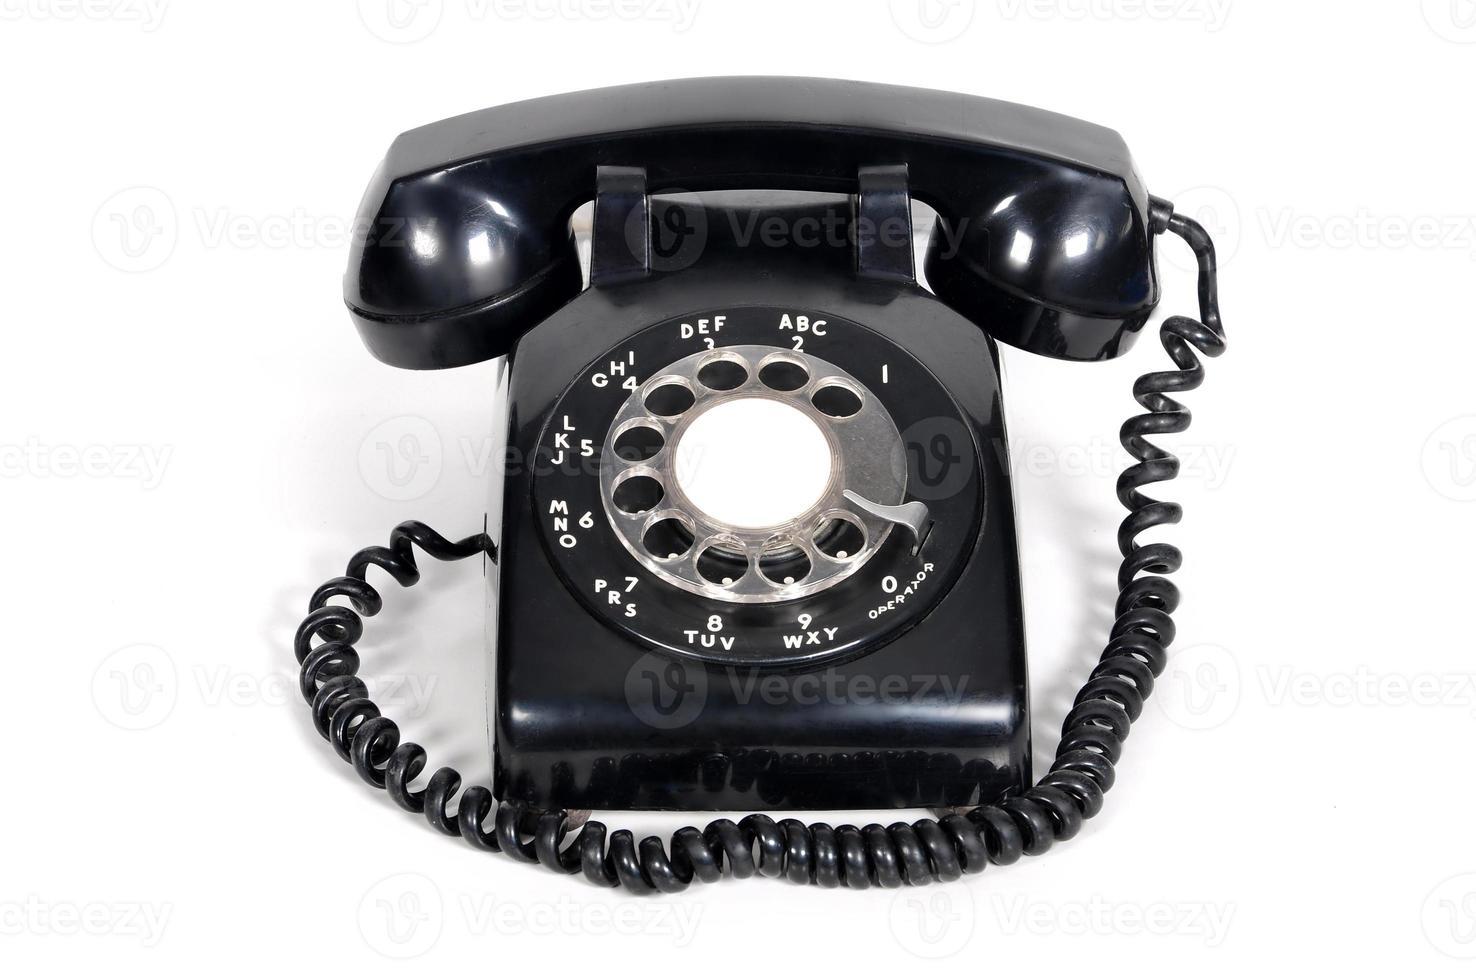 isolerad vintage telefon på vit bakgrund foto